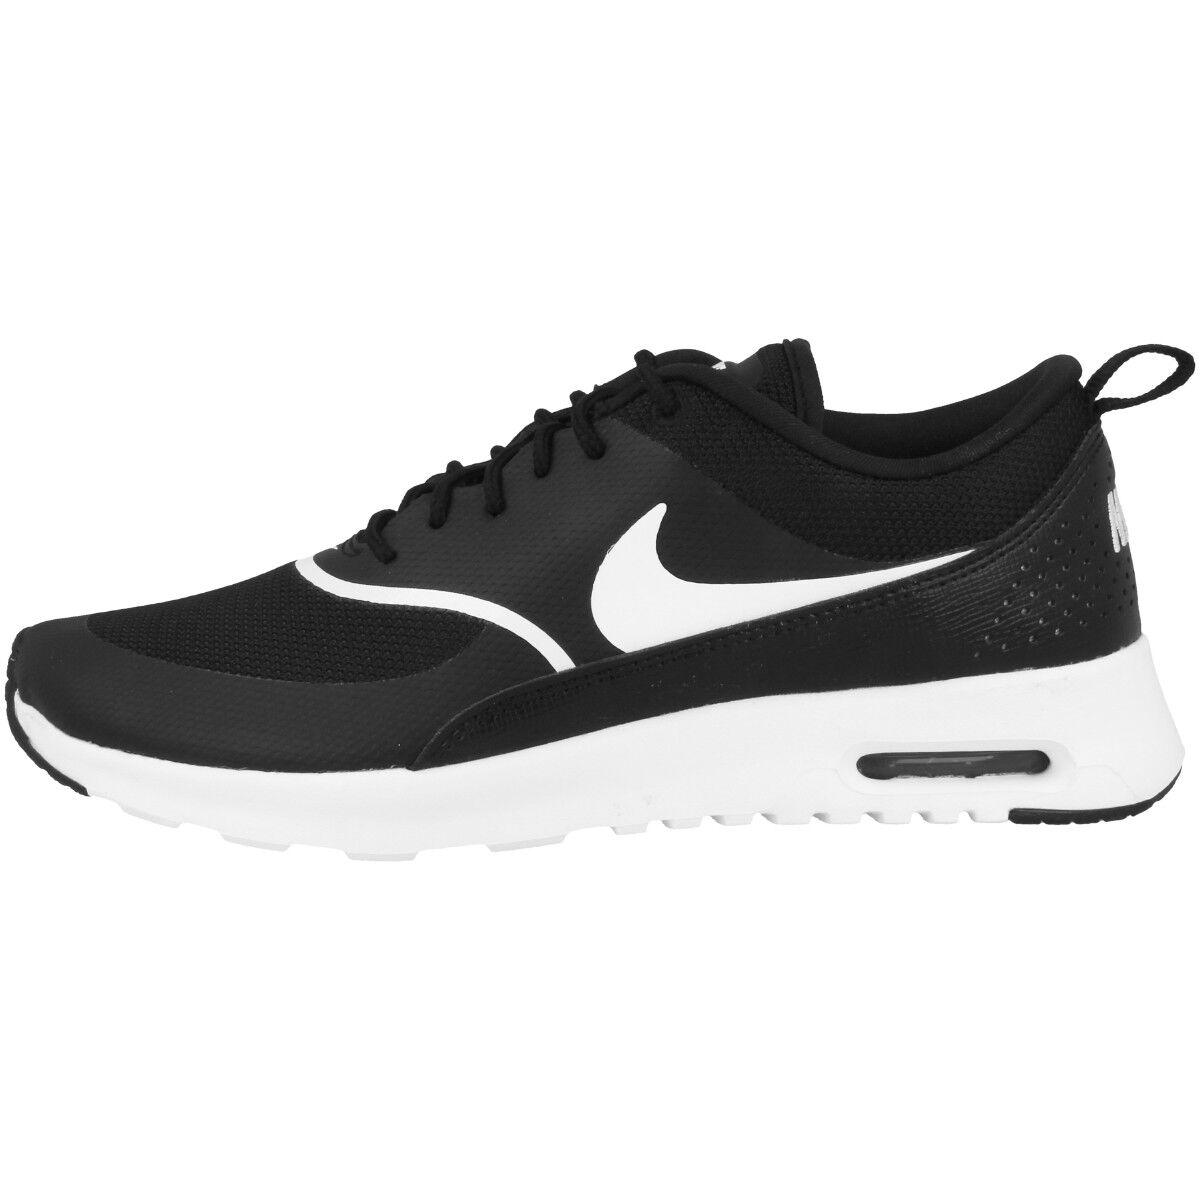 Nike Air Max Thea donne scarpe donna scarpe da ginnastica casual nere bianche 599409-028